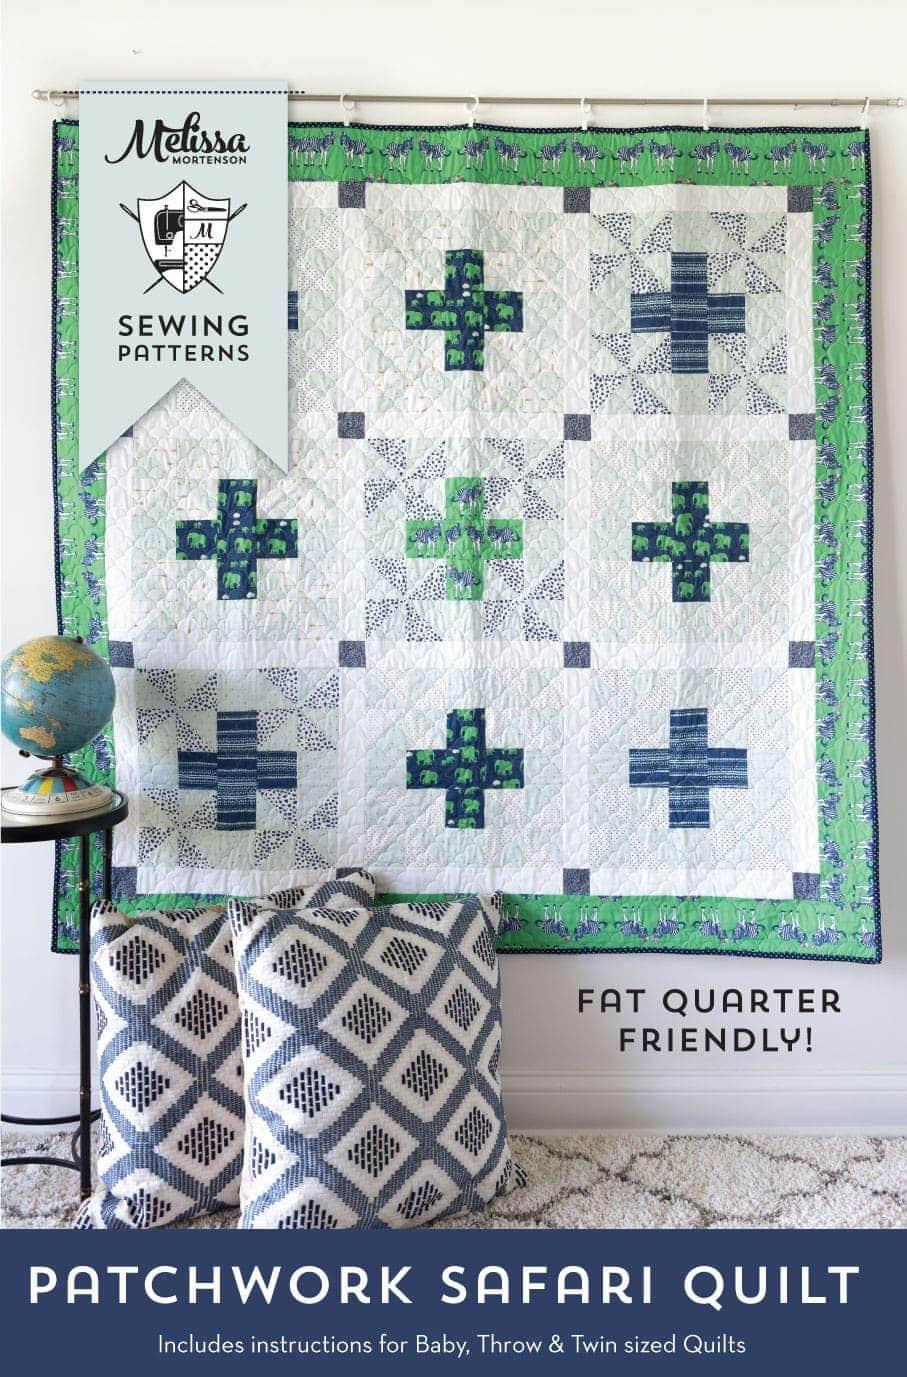 New Patchwork Safari Quilt Pattern!